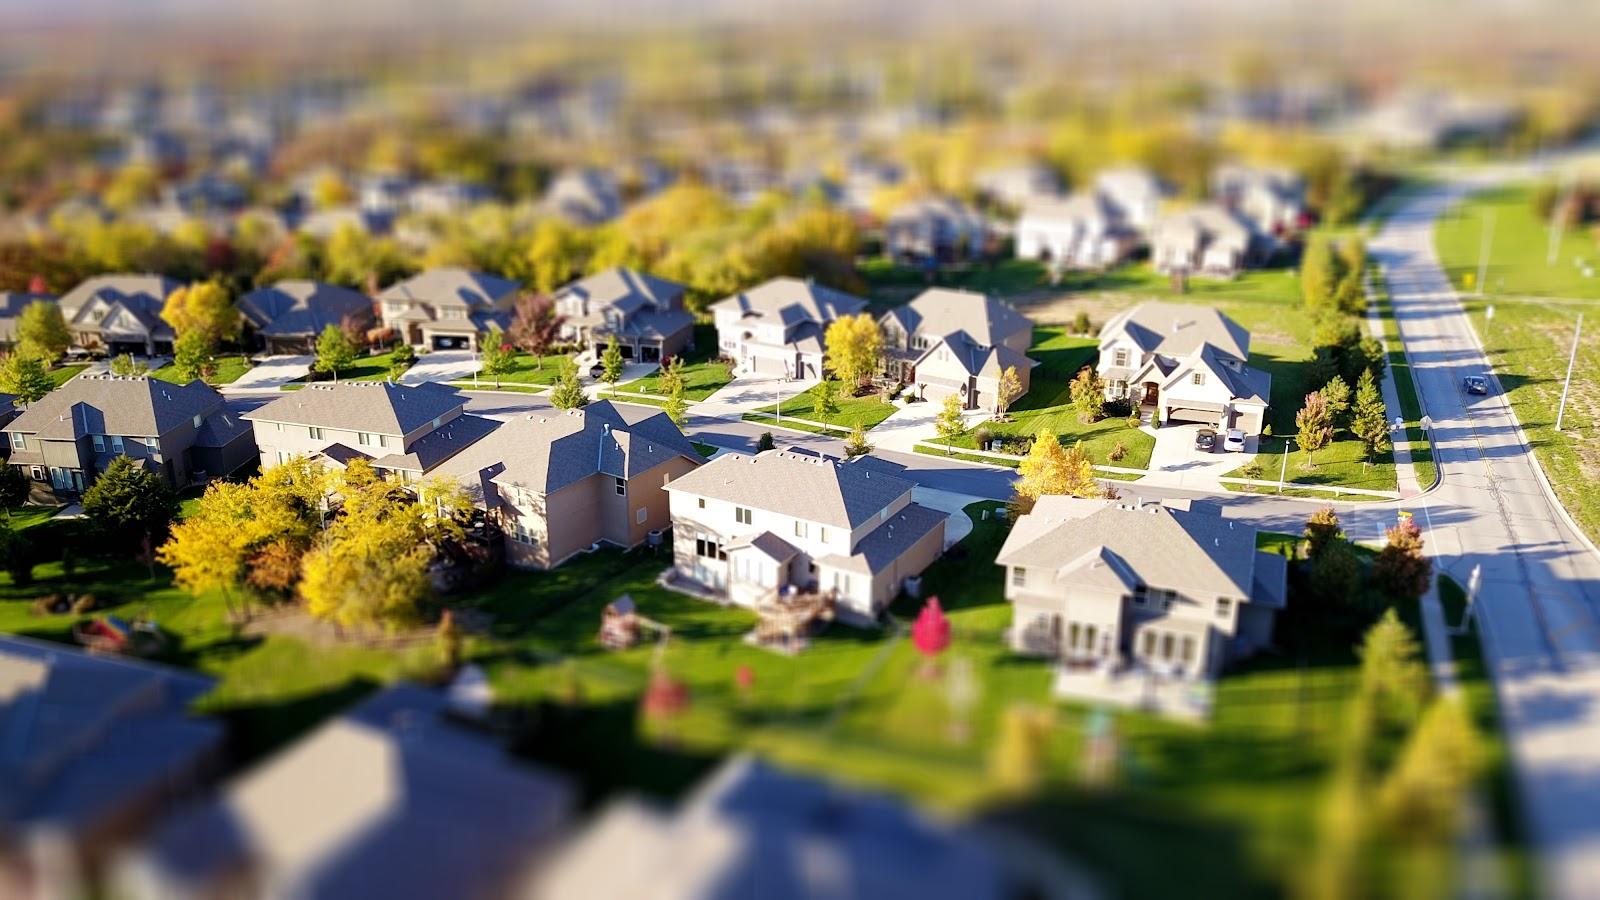 Buyer vs. Seller Behavior Amid COVID-19 Concerns